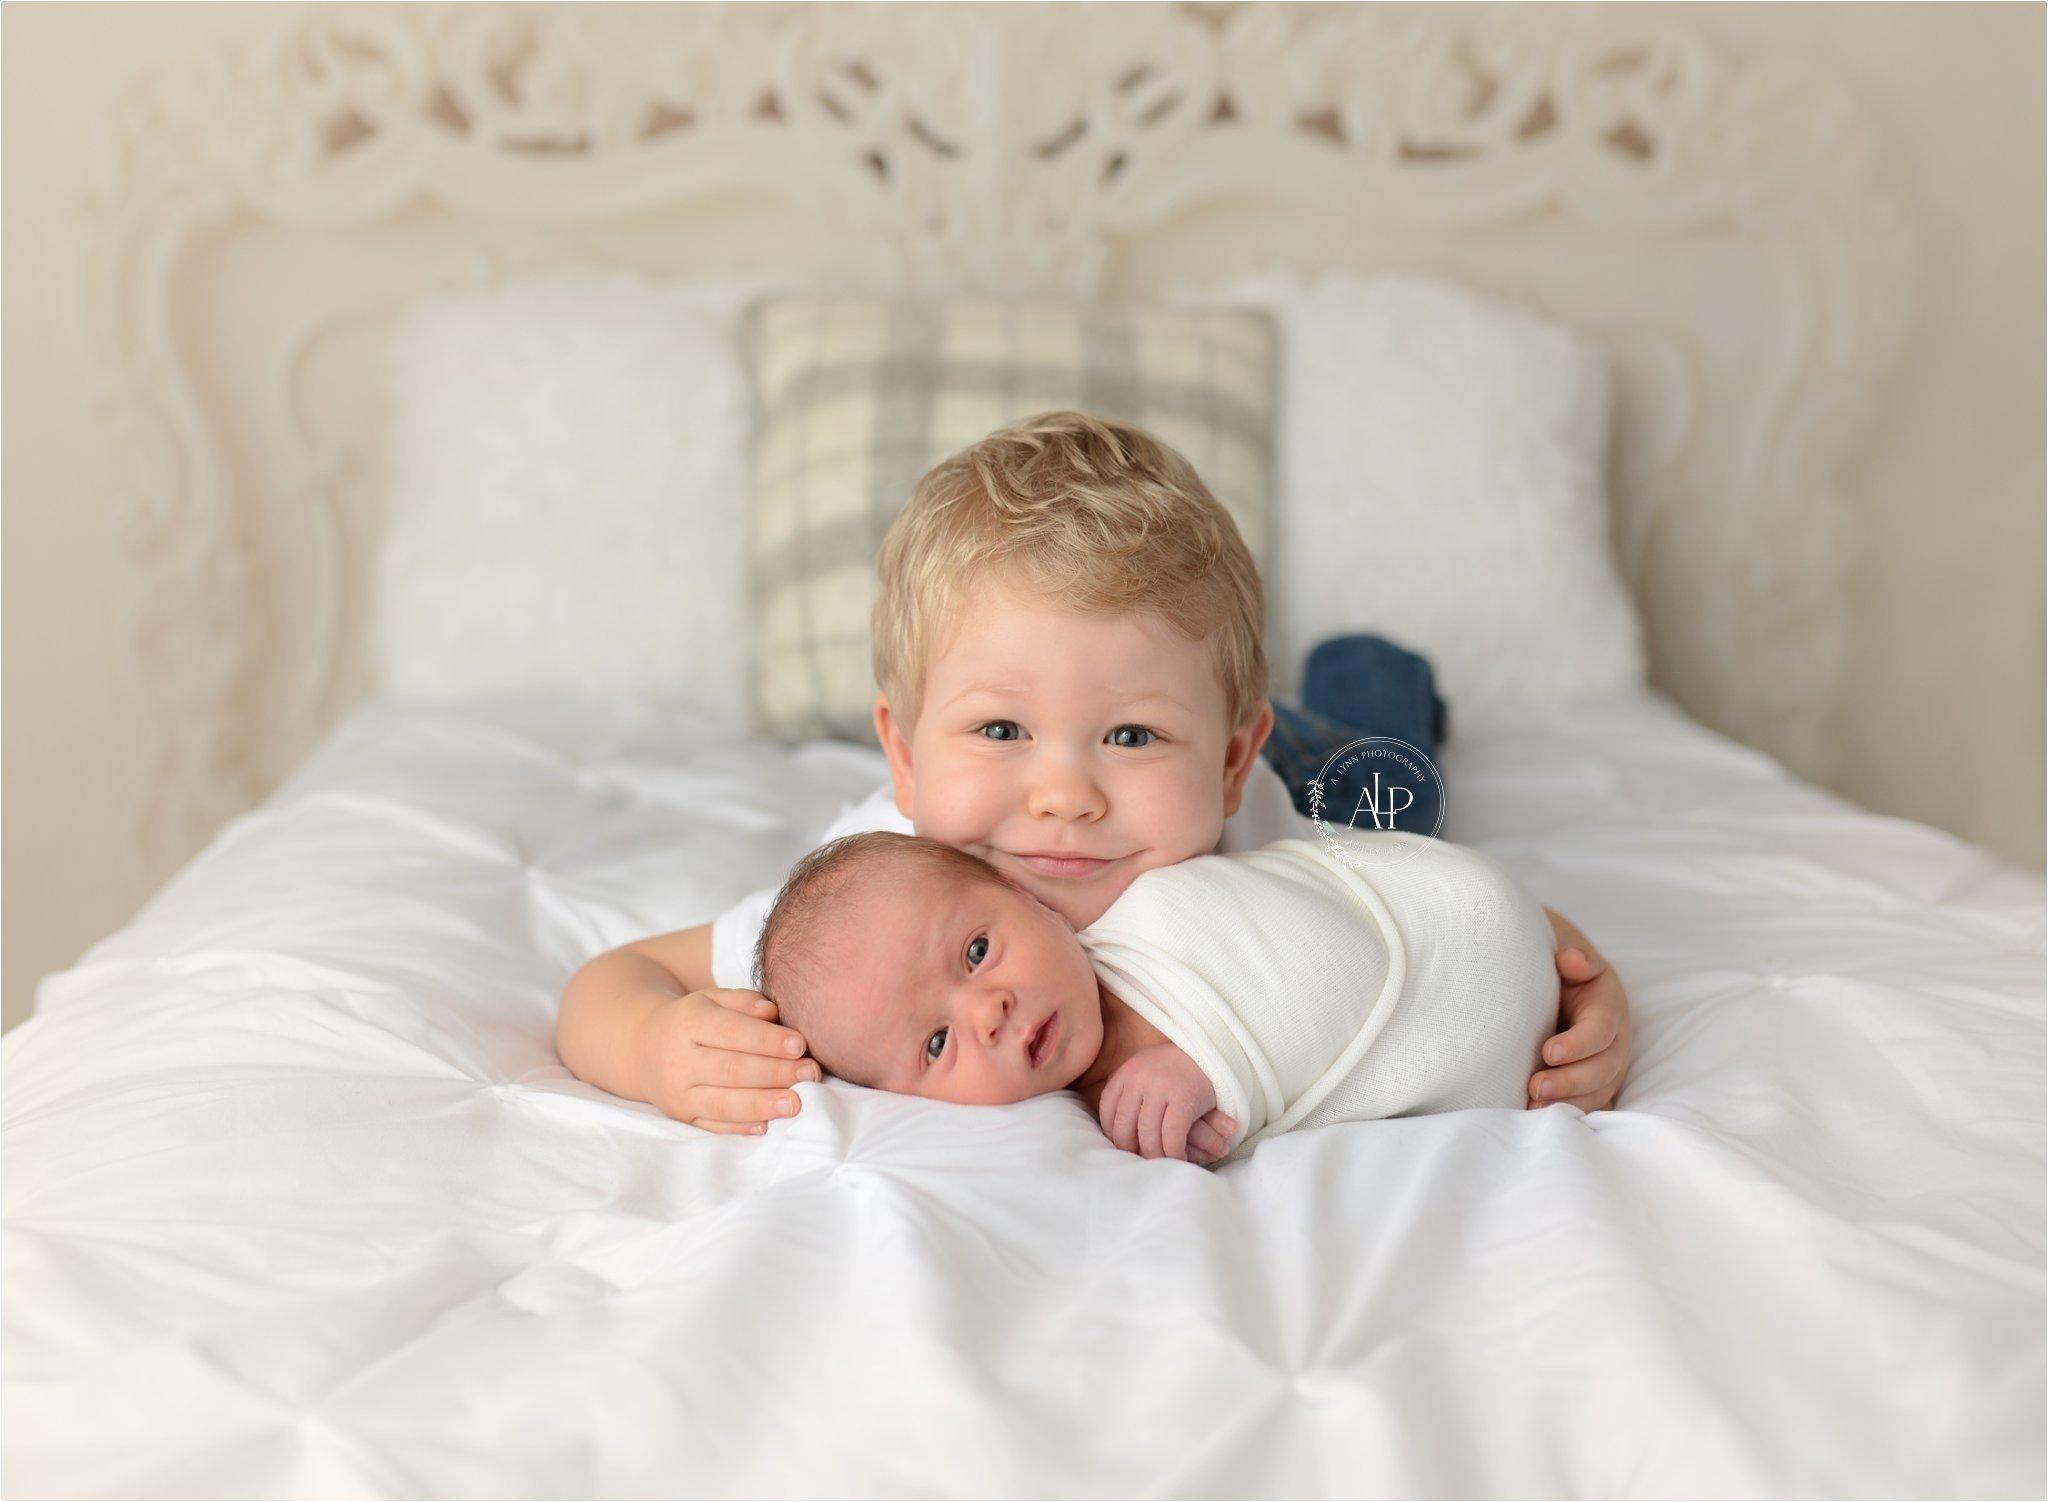 10 Stylish Newborn Photo Ideas With Siblings newborn with sibling brothers newborn poses newborn posesa 2020